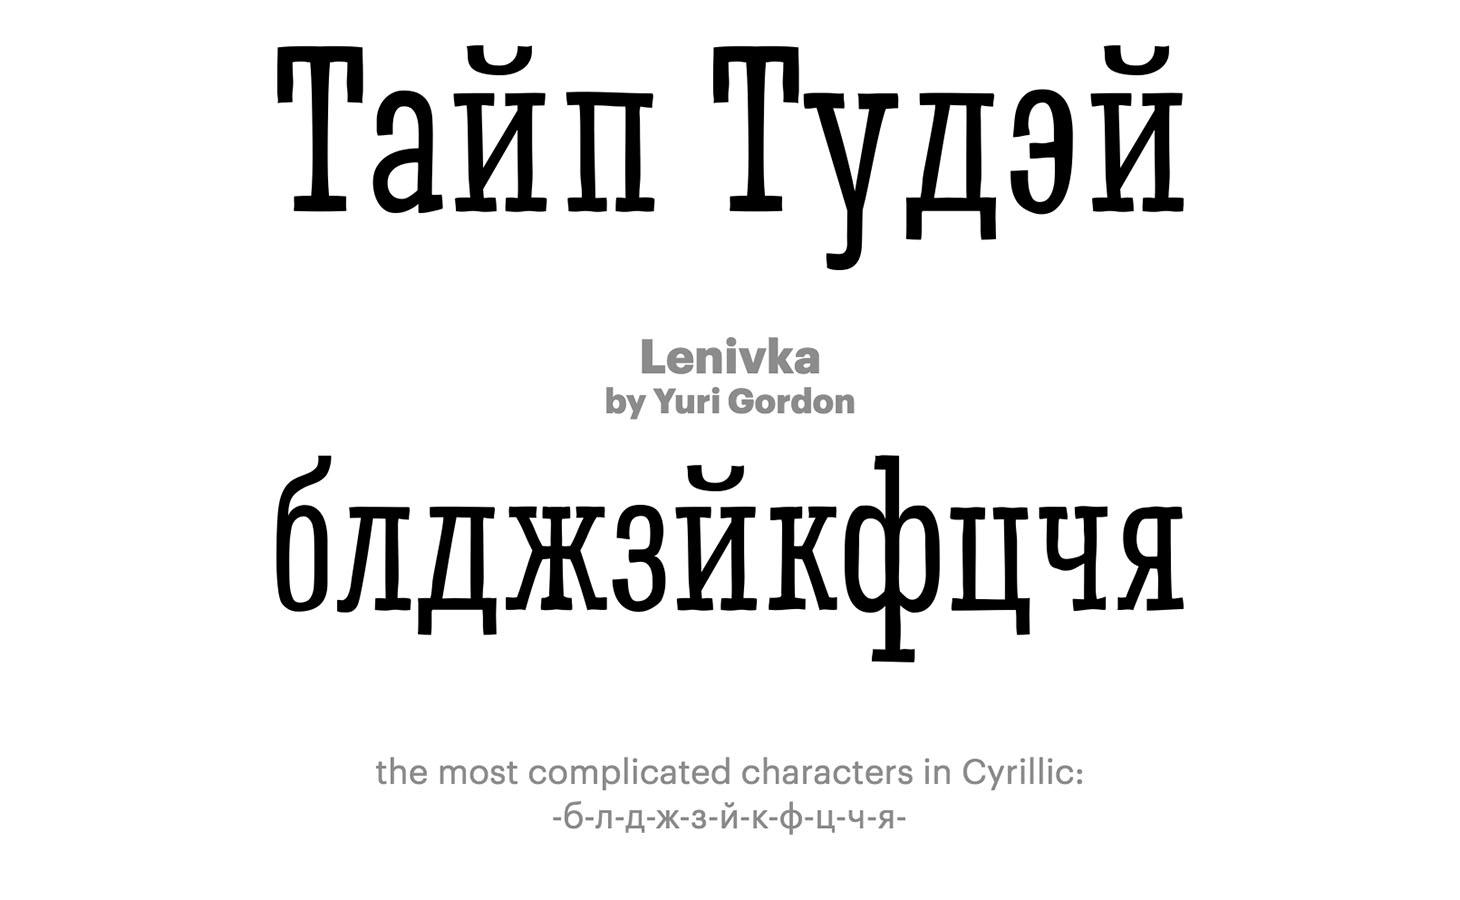 Lenivka